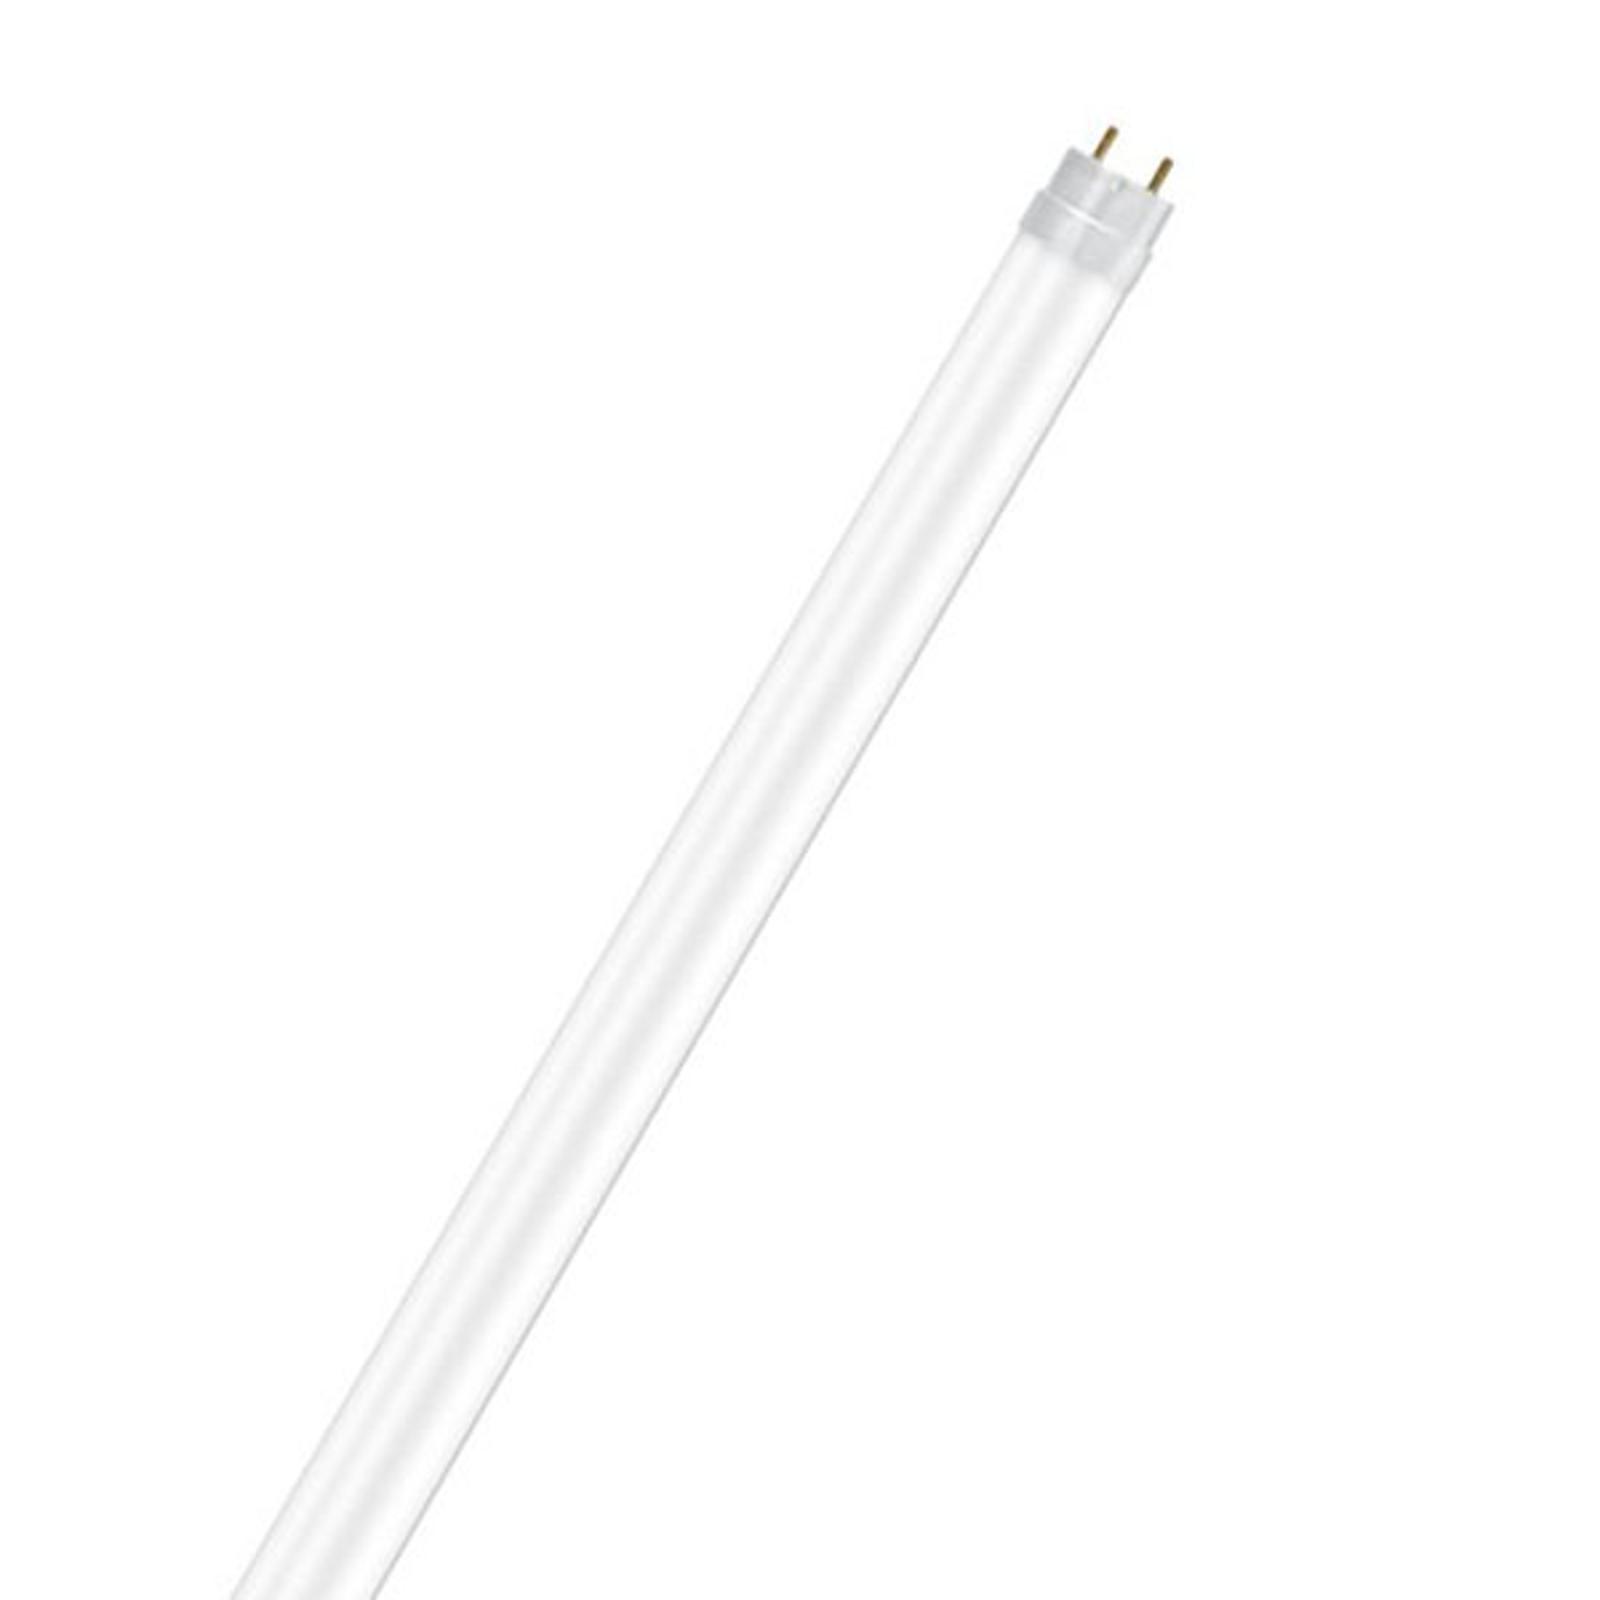 OSRAM LED-Röhre G13 60cm SubstiTUBE 7,3W 3.000K